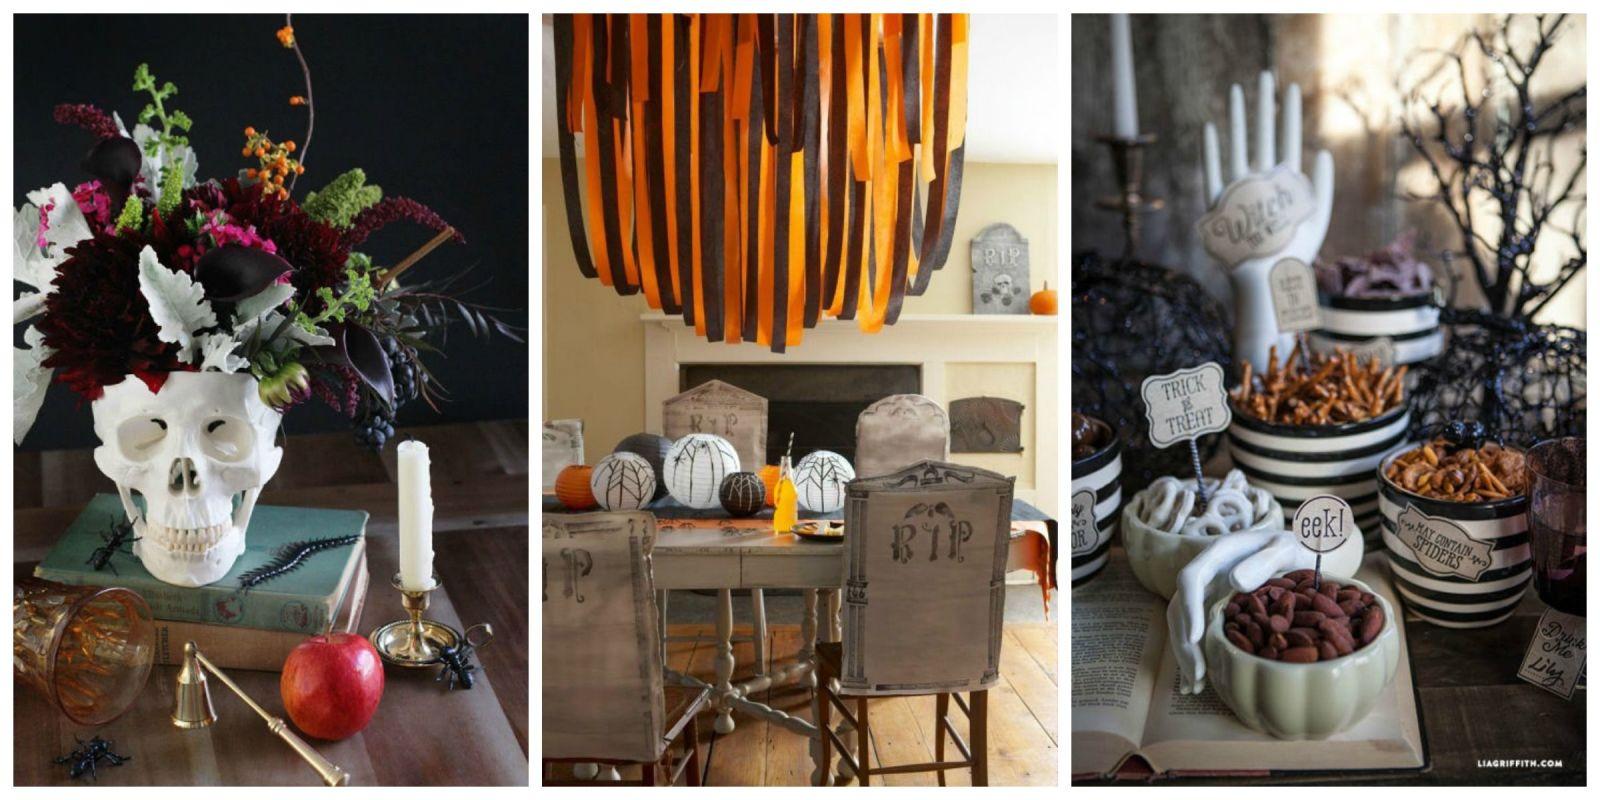 Halloween food table decorations - 17 Halloween Centerpieces Table Decorations Diy Ideas For Halloween Themed Tables